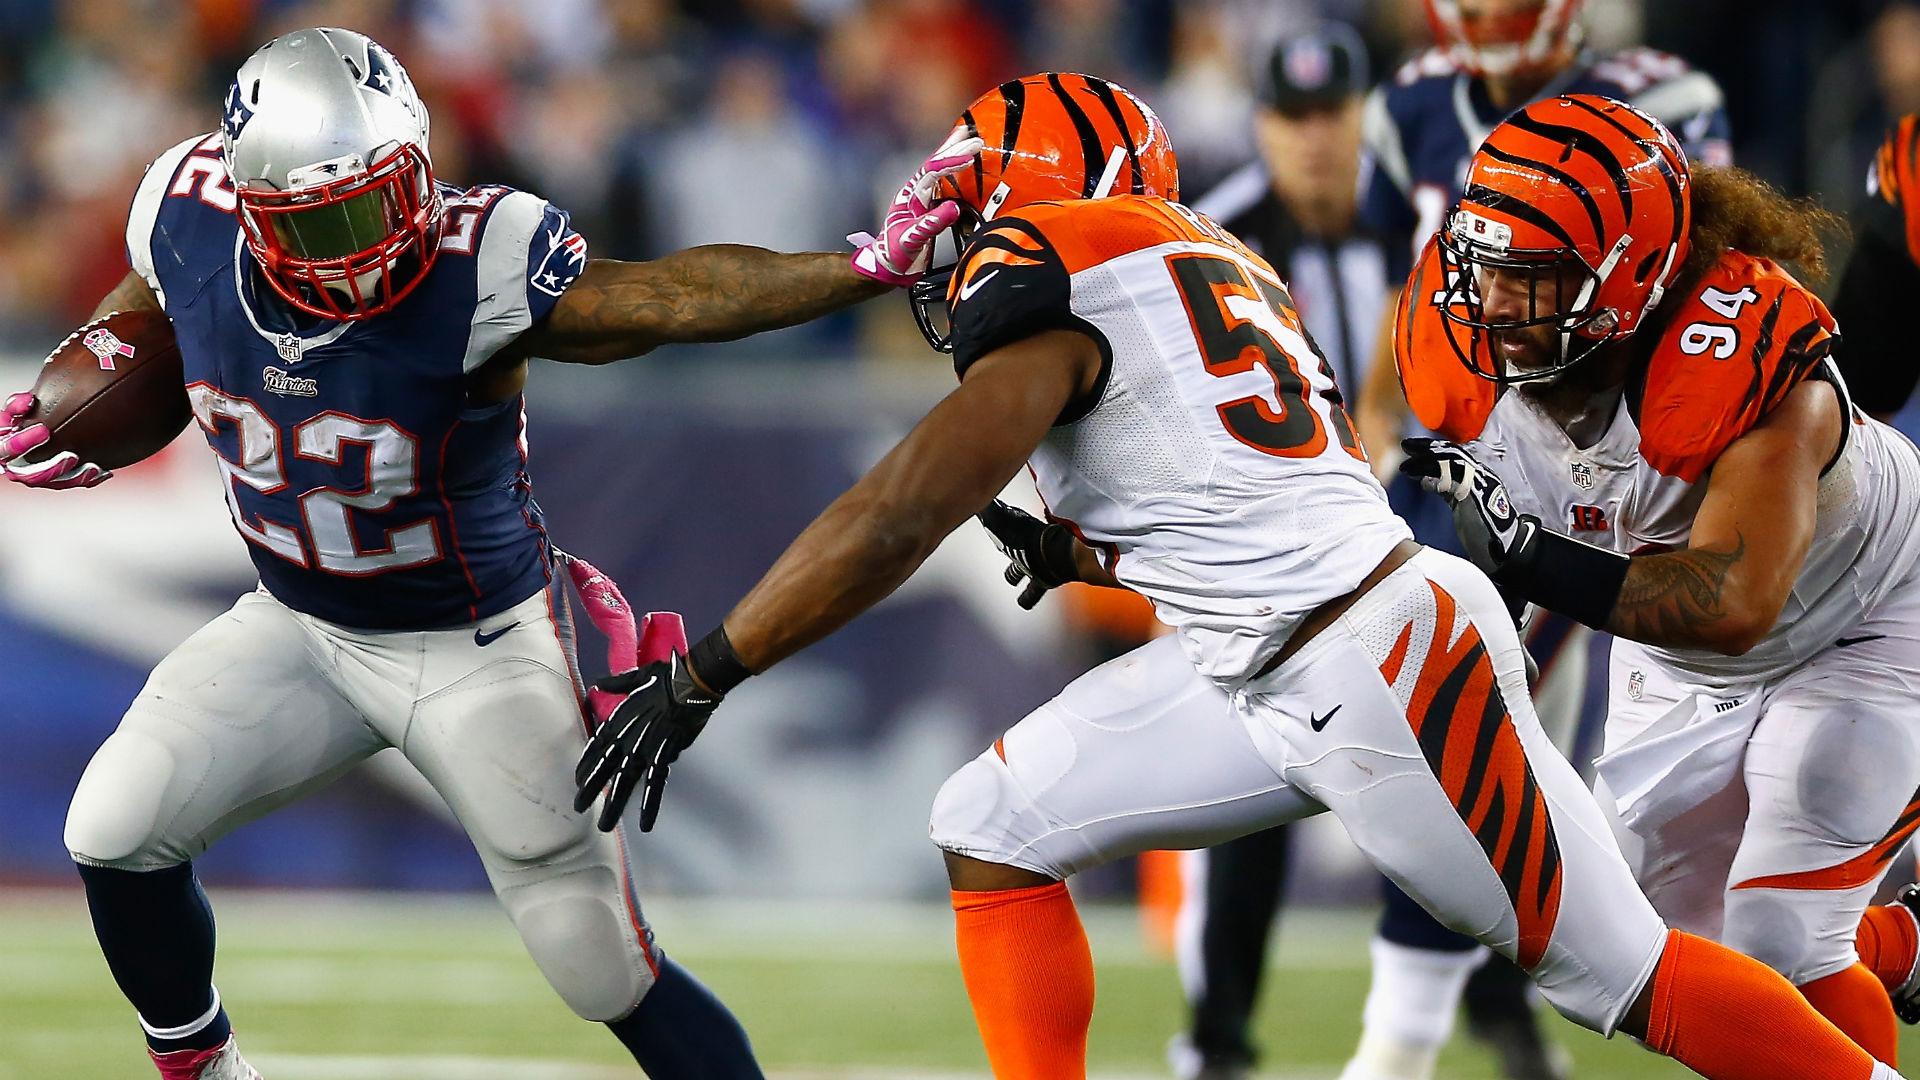 NFL Scores Week 5: Patriots Rout Bengals, 49ers Get By